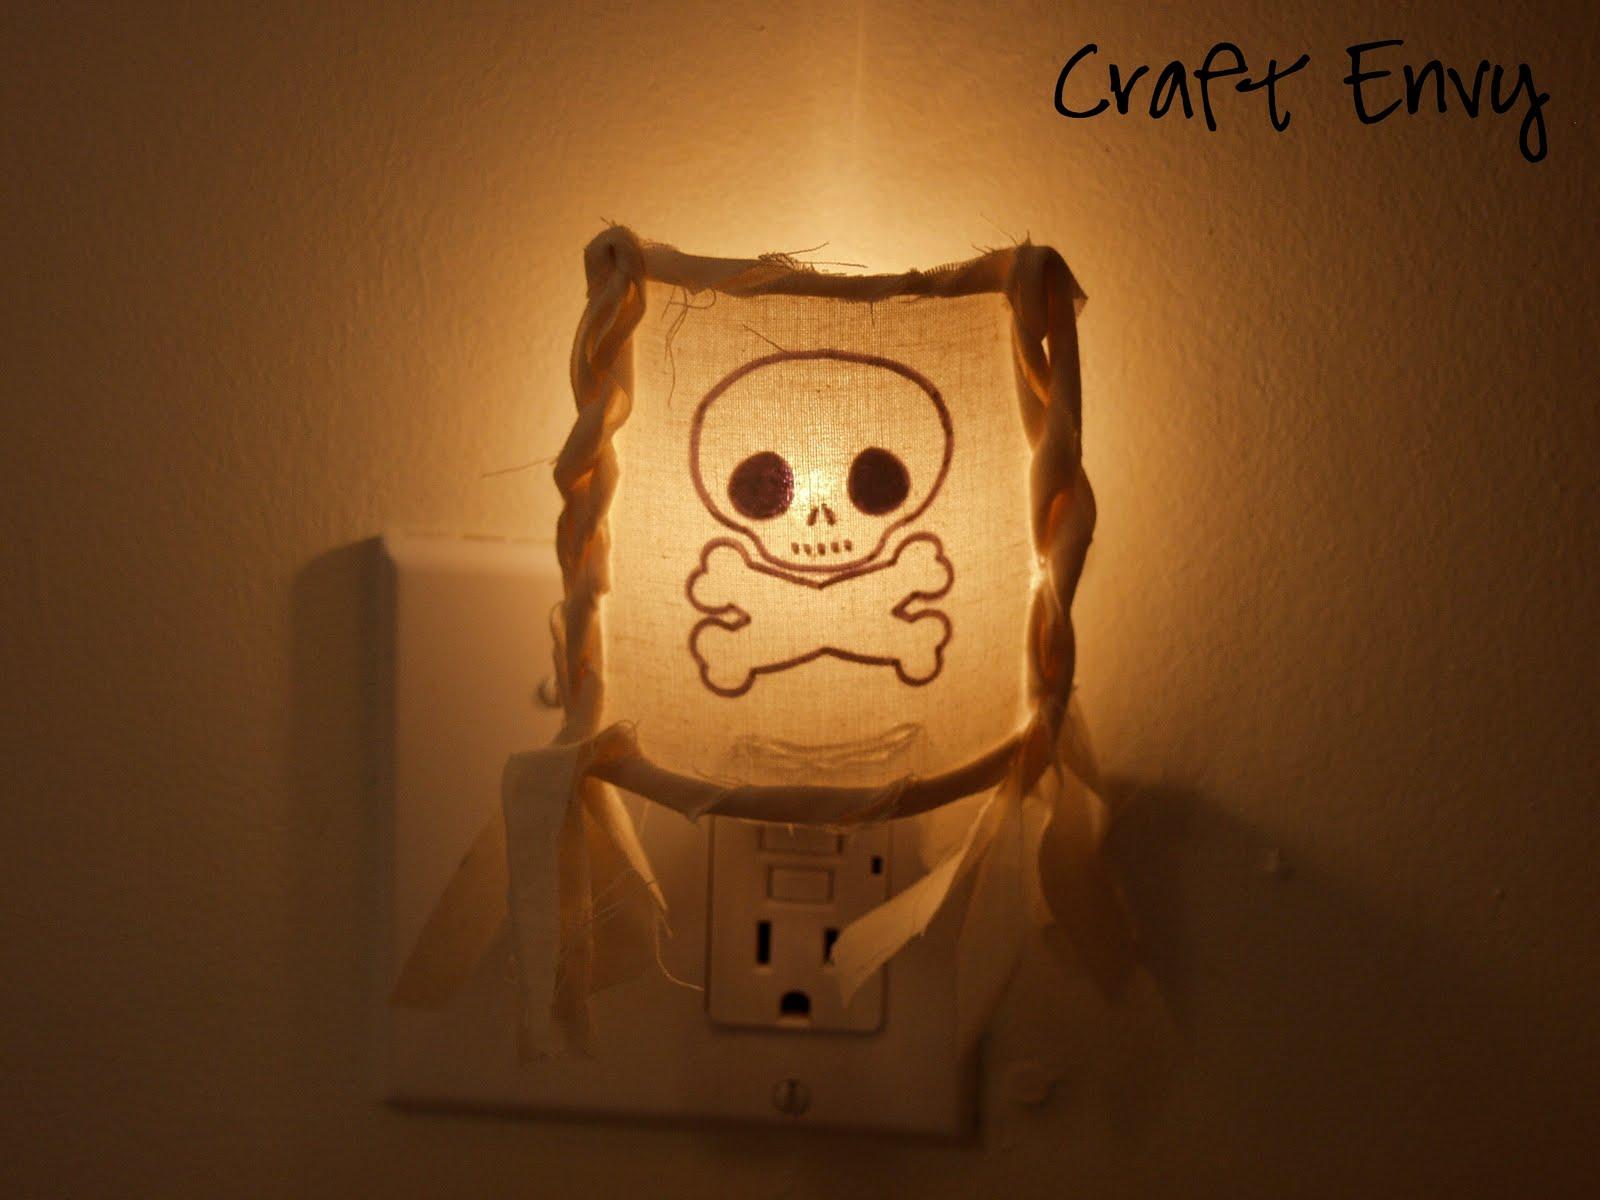 Craft Envy: Pirate Nightlight